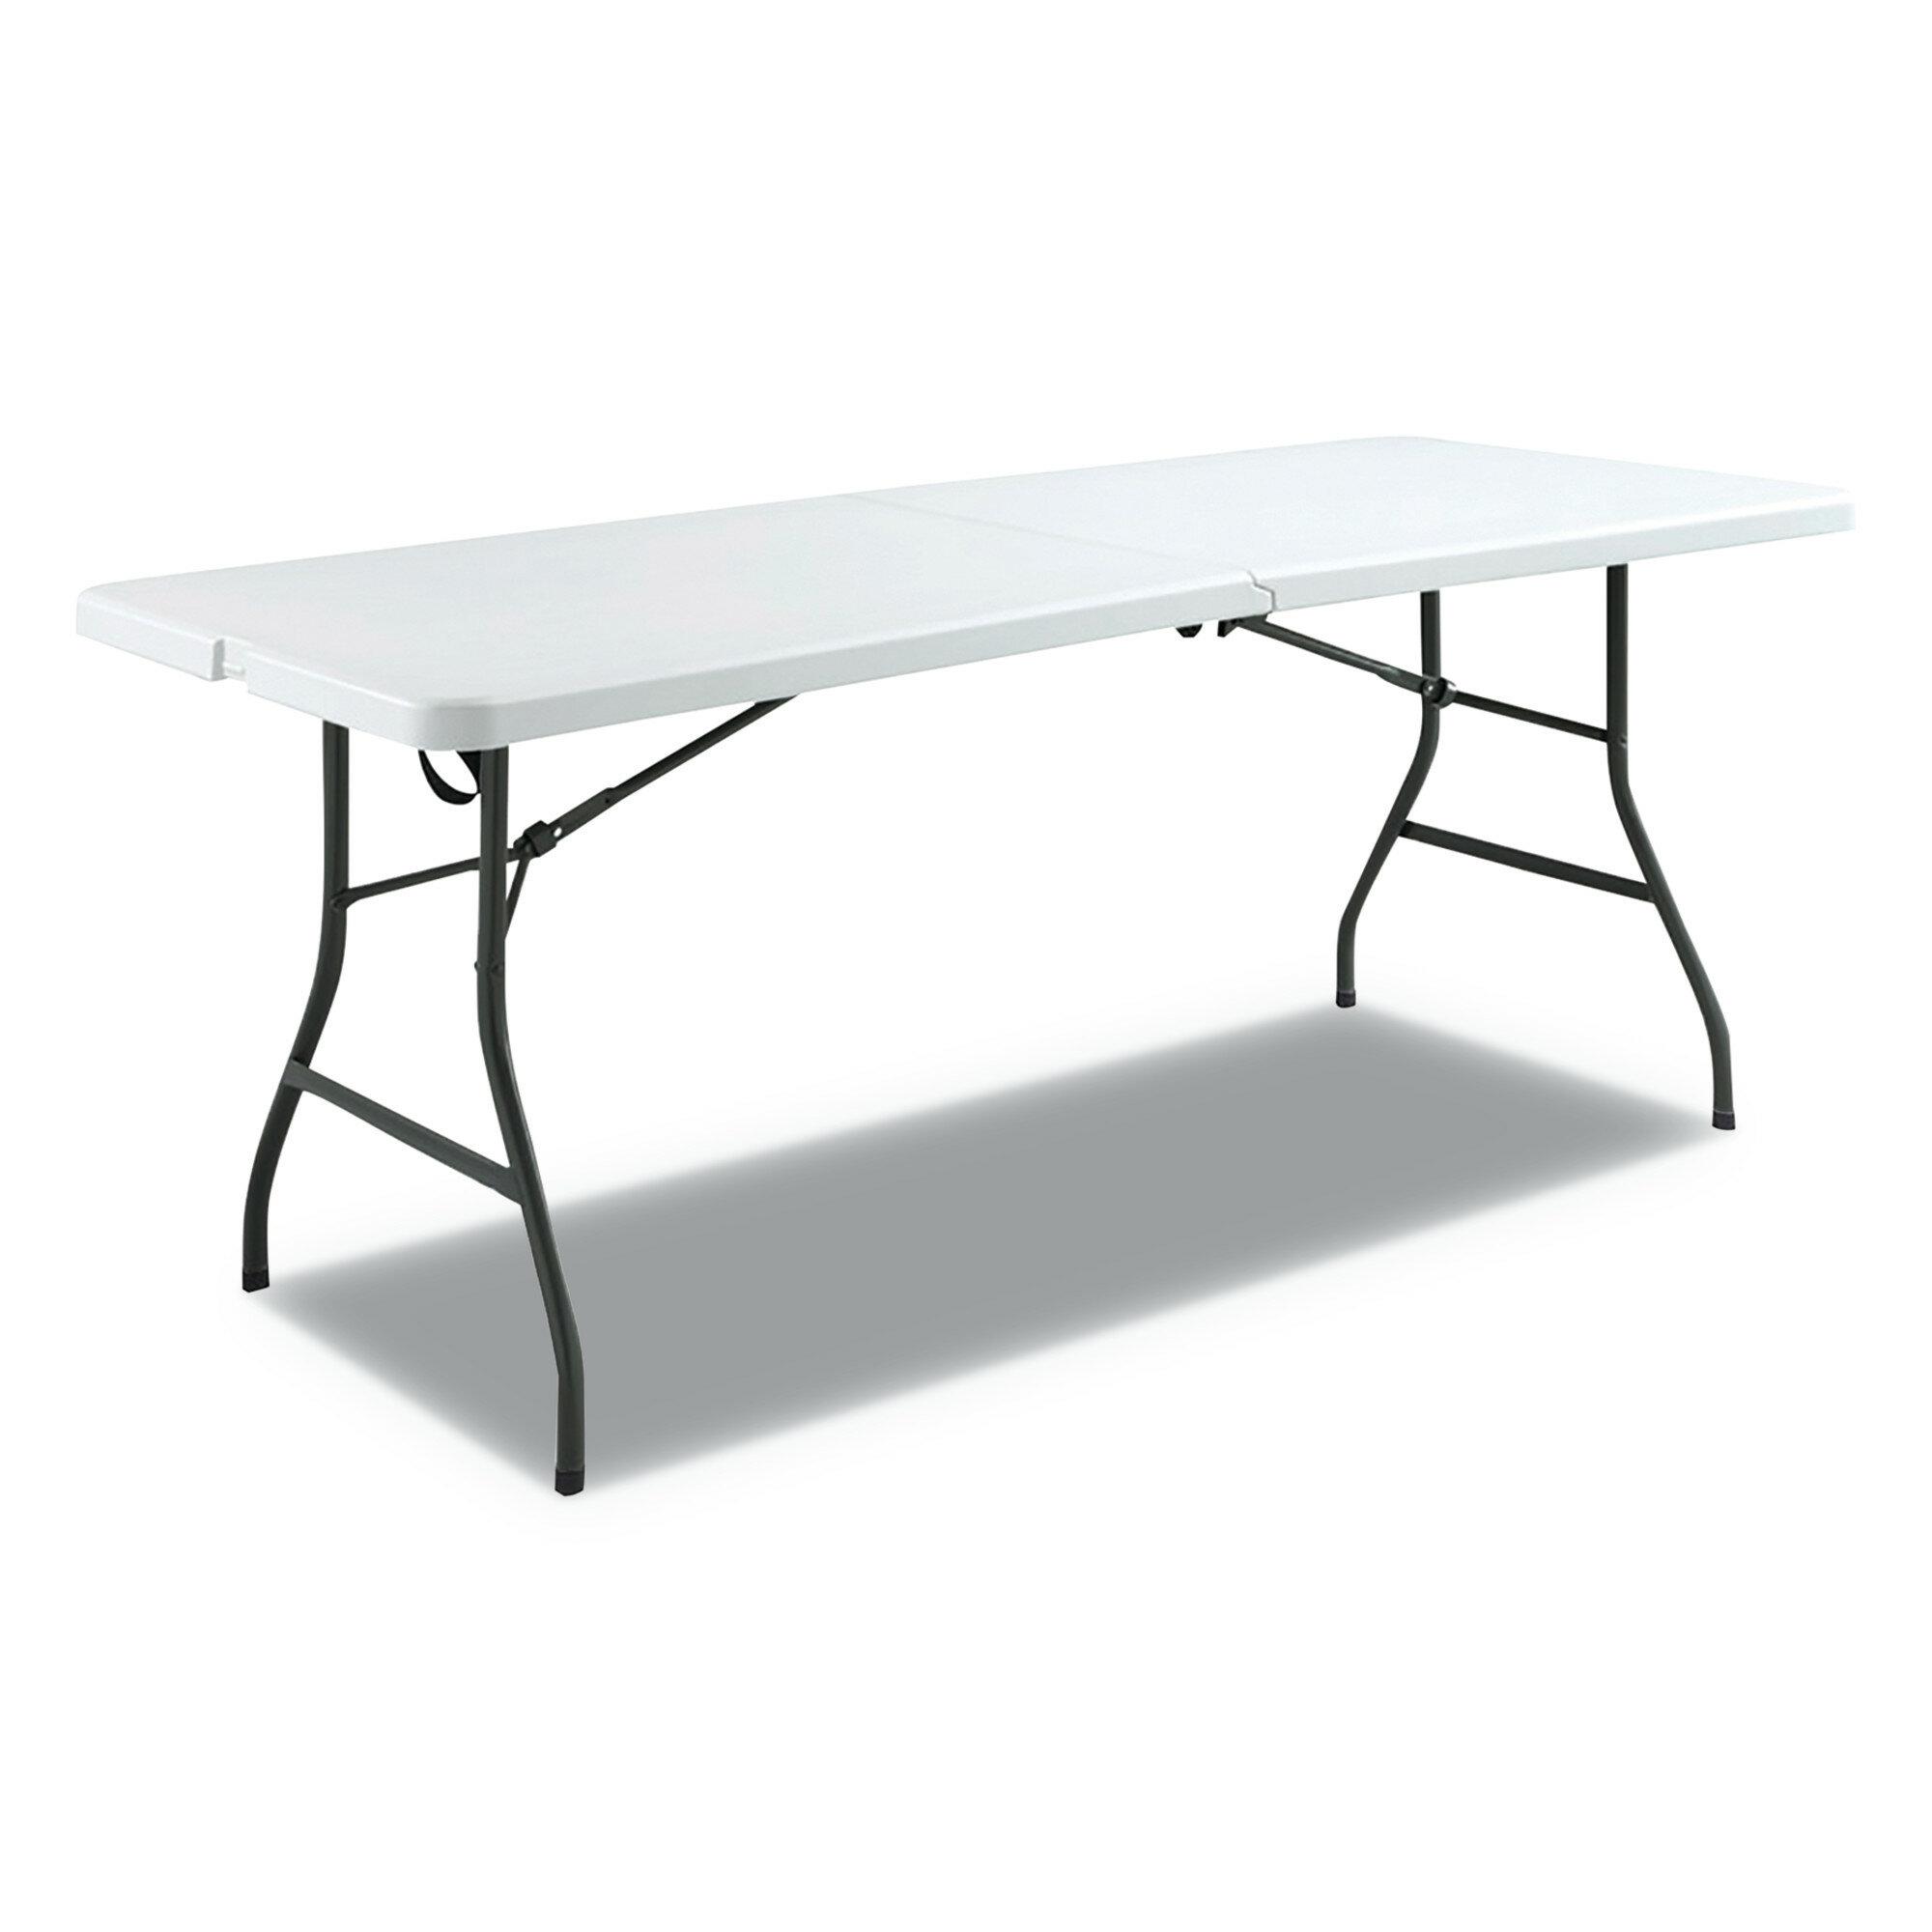 Rhinolite Fold In Half Rectangle Plastic Folding Table Locking Steel Frame Rattan Tables Home Garden